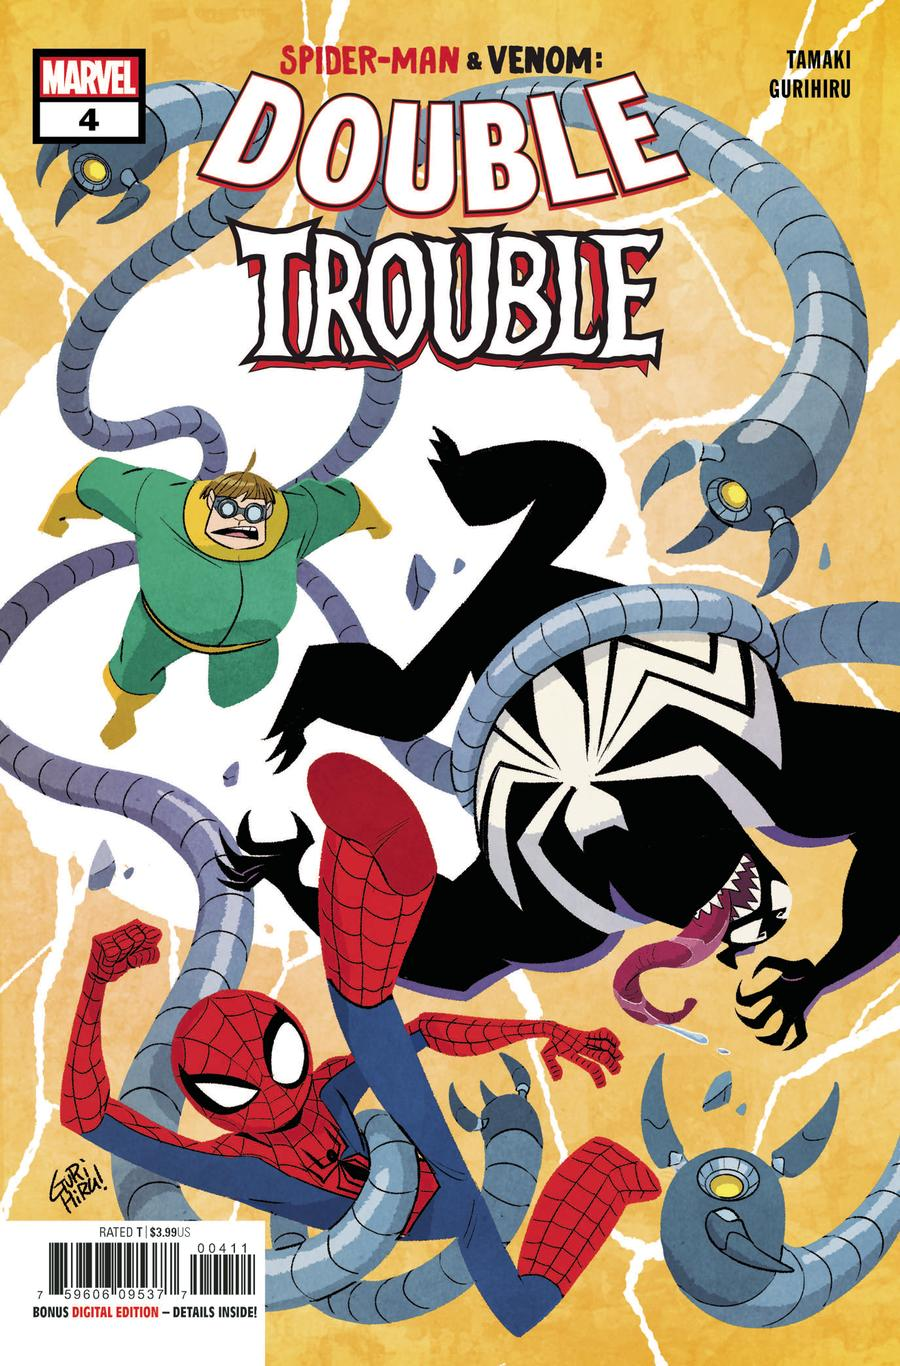 Spider-Man Venom Double Trouble #4